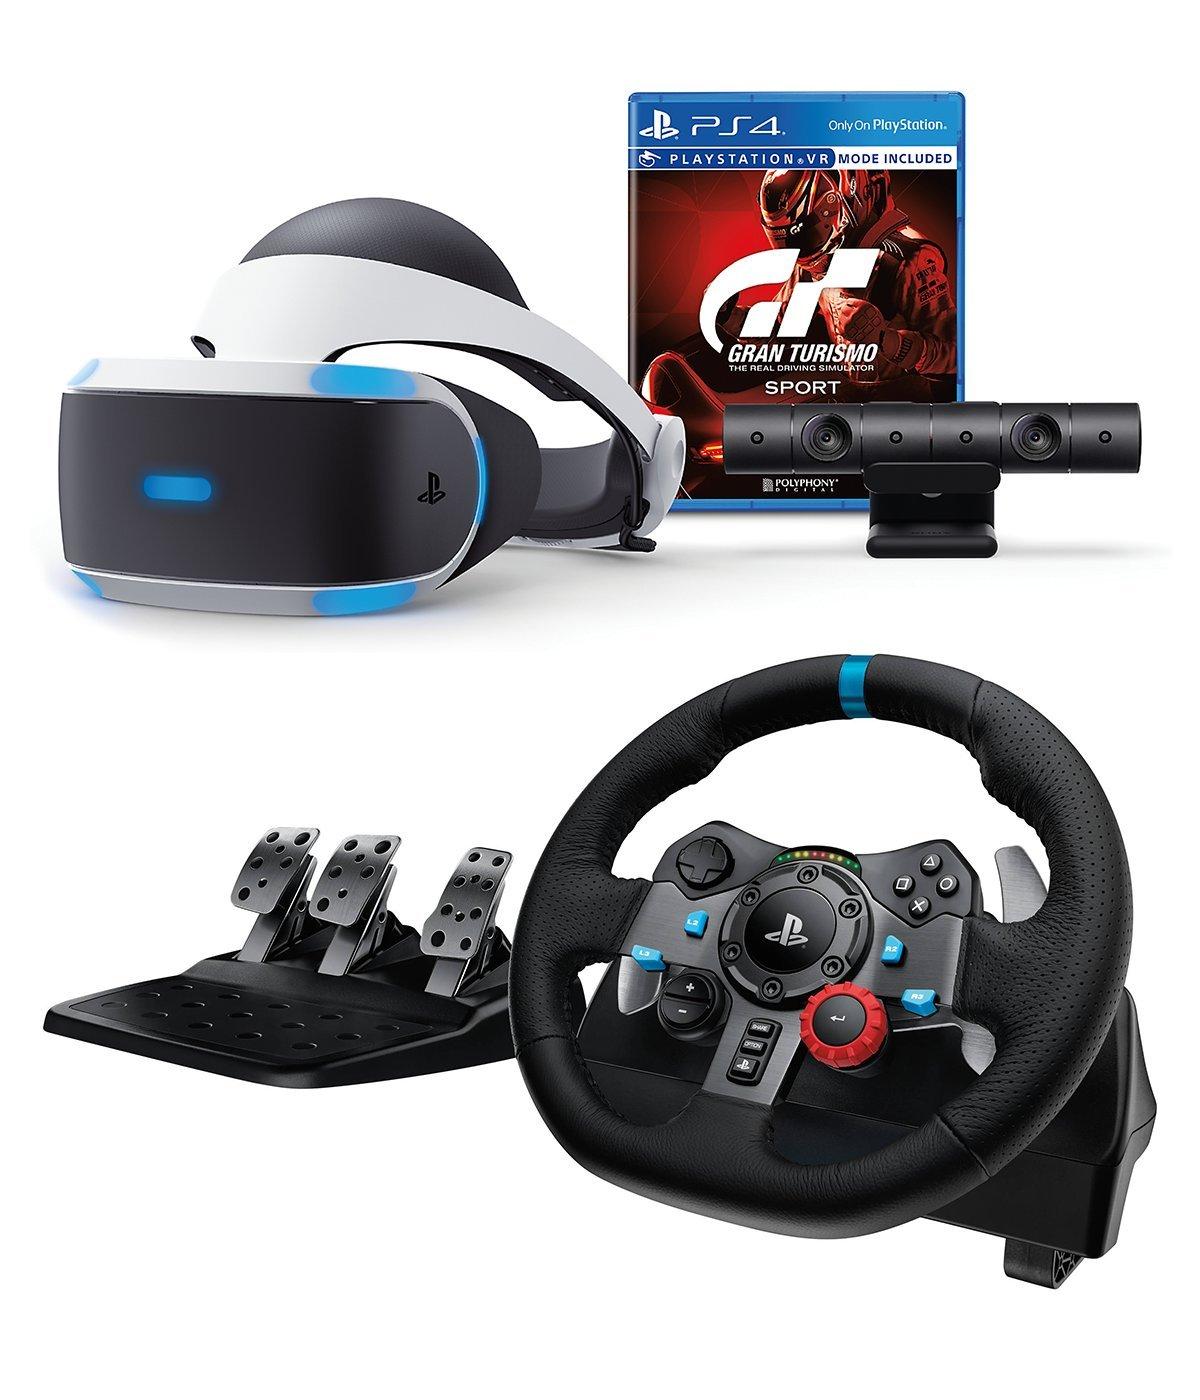 46d790d4de2 Amazon.com: Playstation VR Enhanced Gran Turismo Sport with Logitech  Dual-Motor Feedback Driving Force G29 Racing Wheel (PC + PS4 Compatible)  Bundle: ...